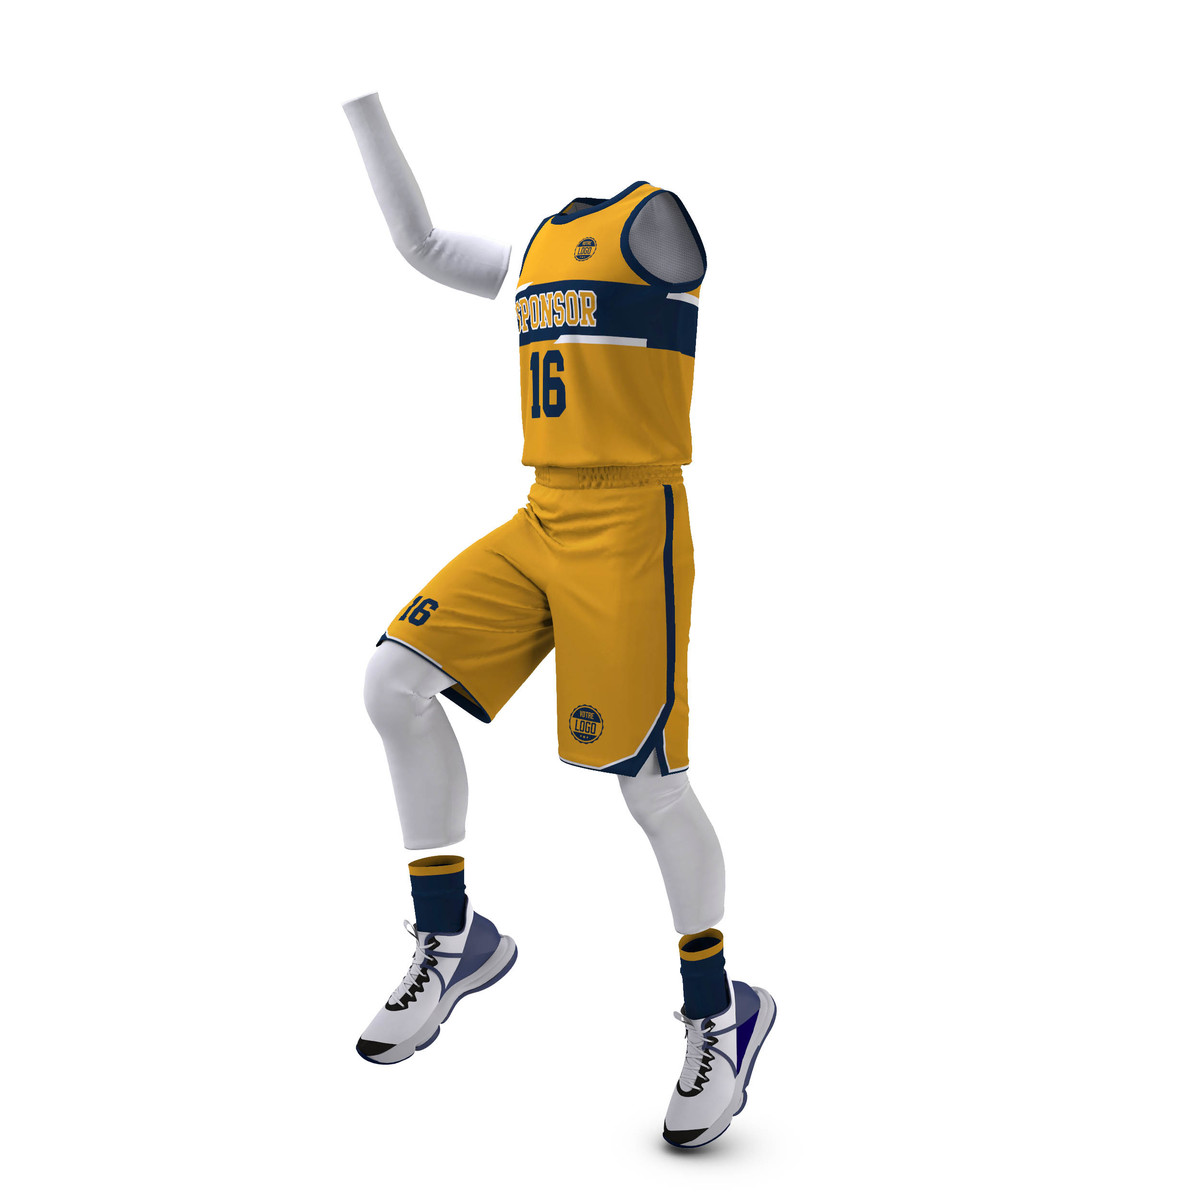 Image_basketball-18-set5-v2--0-0--a2591e1c-2d72-4d89-a39b-949b9894a09d